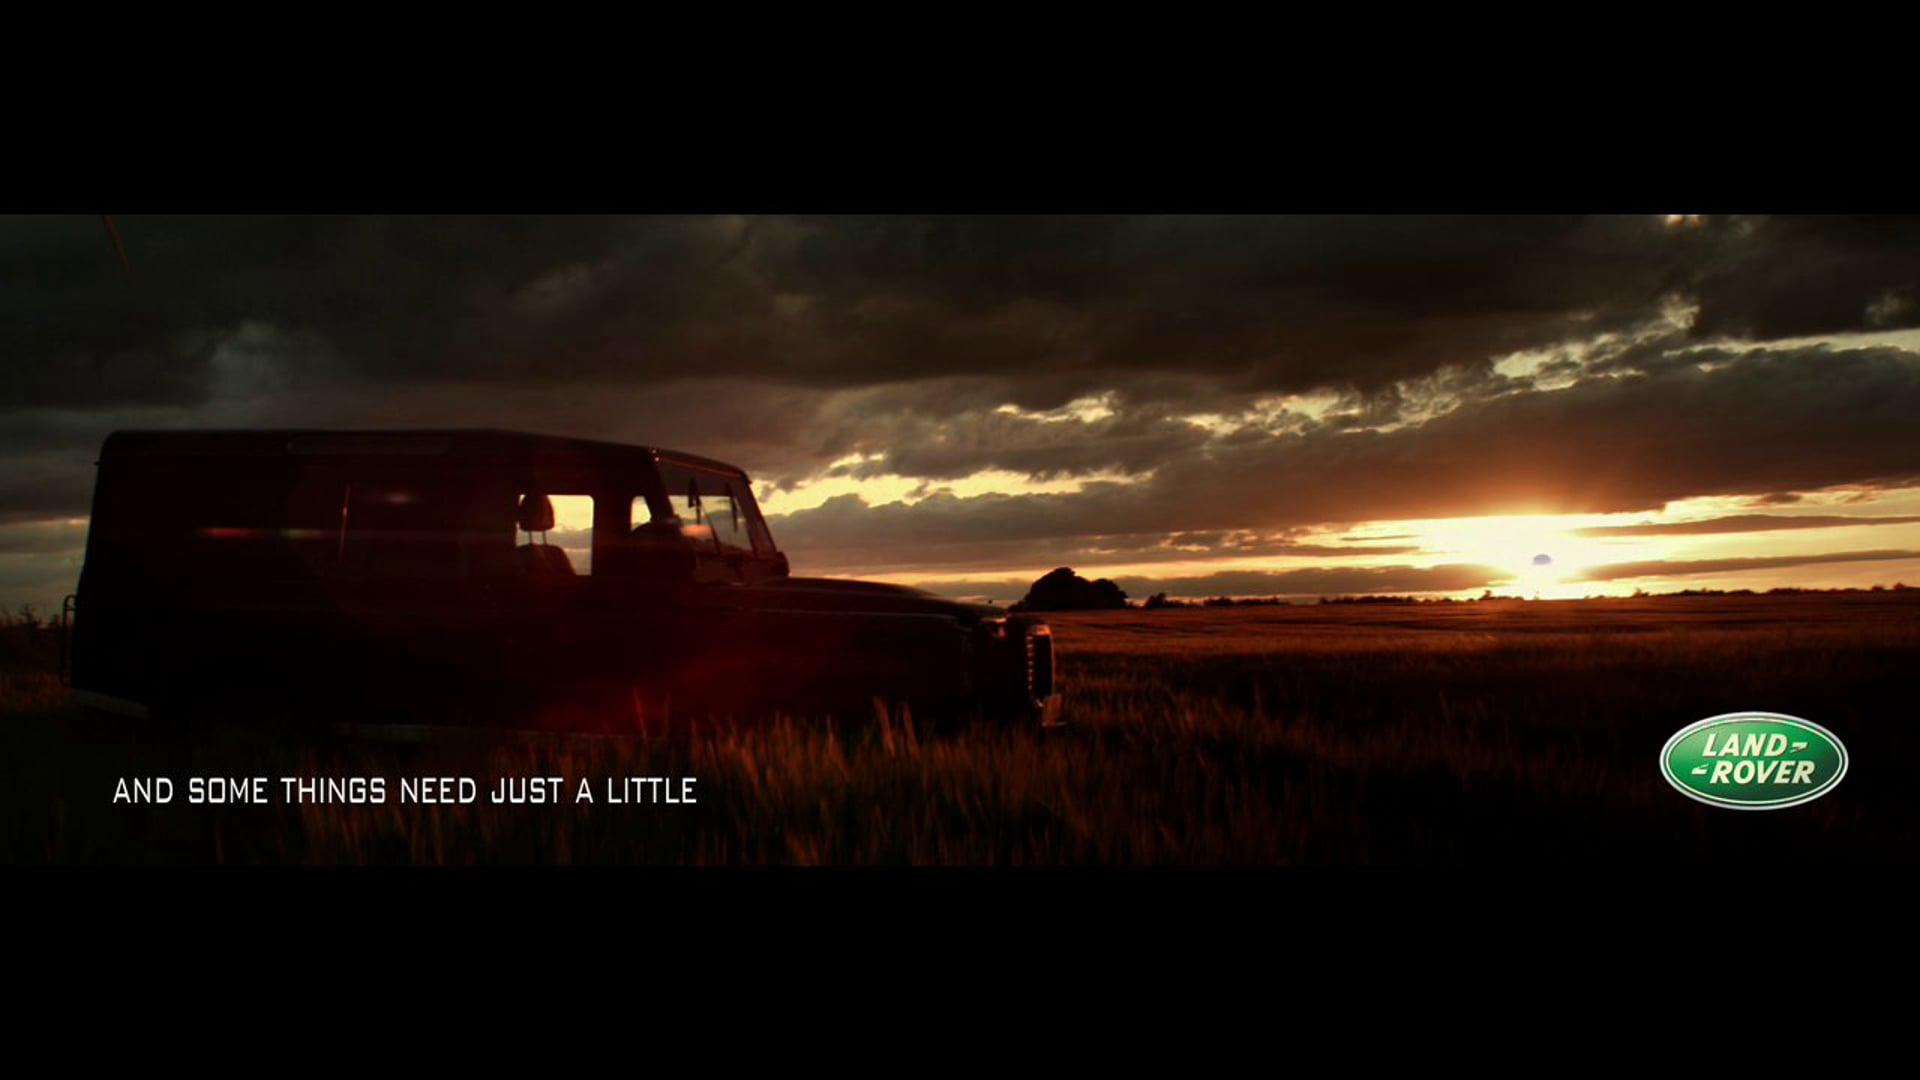 Land Rover - Change